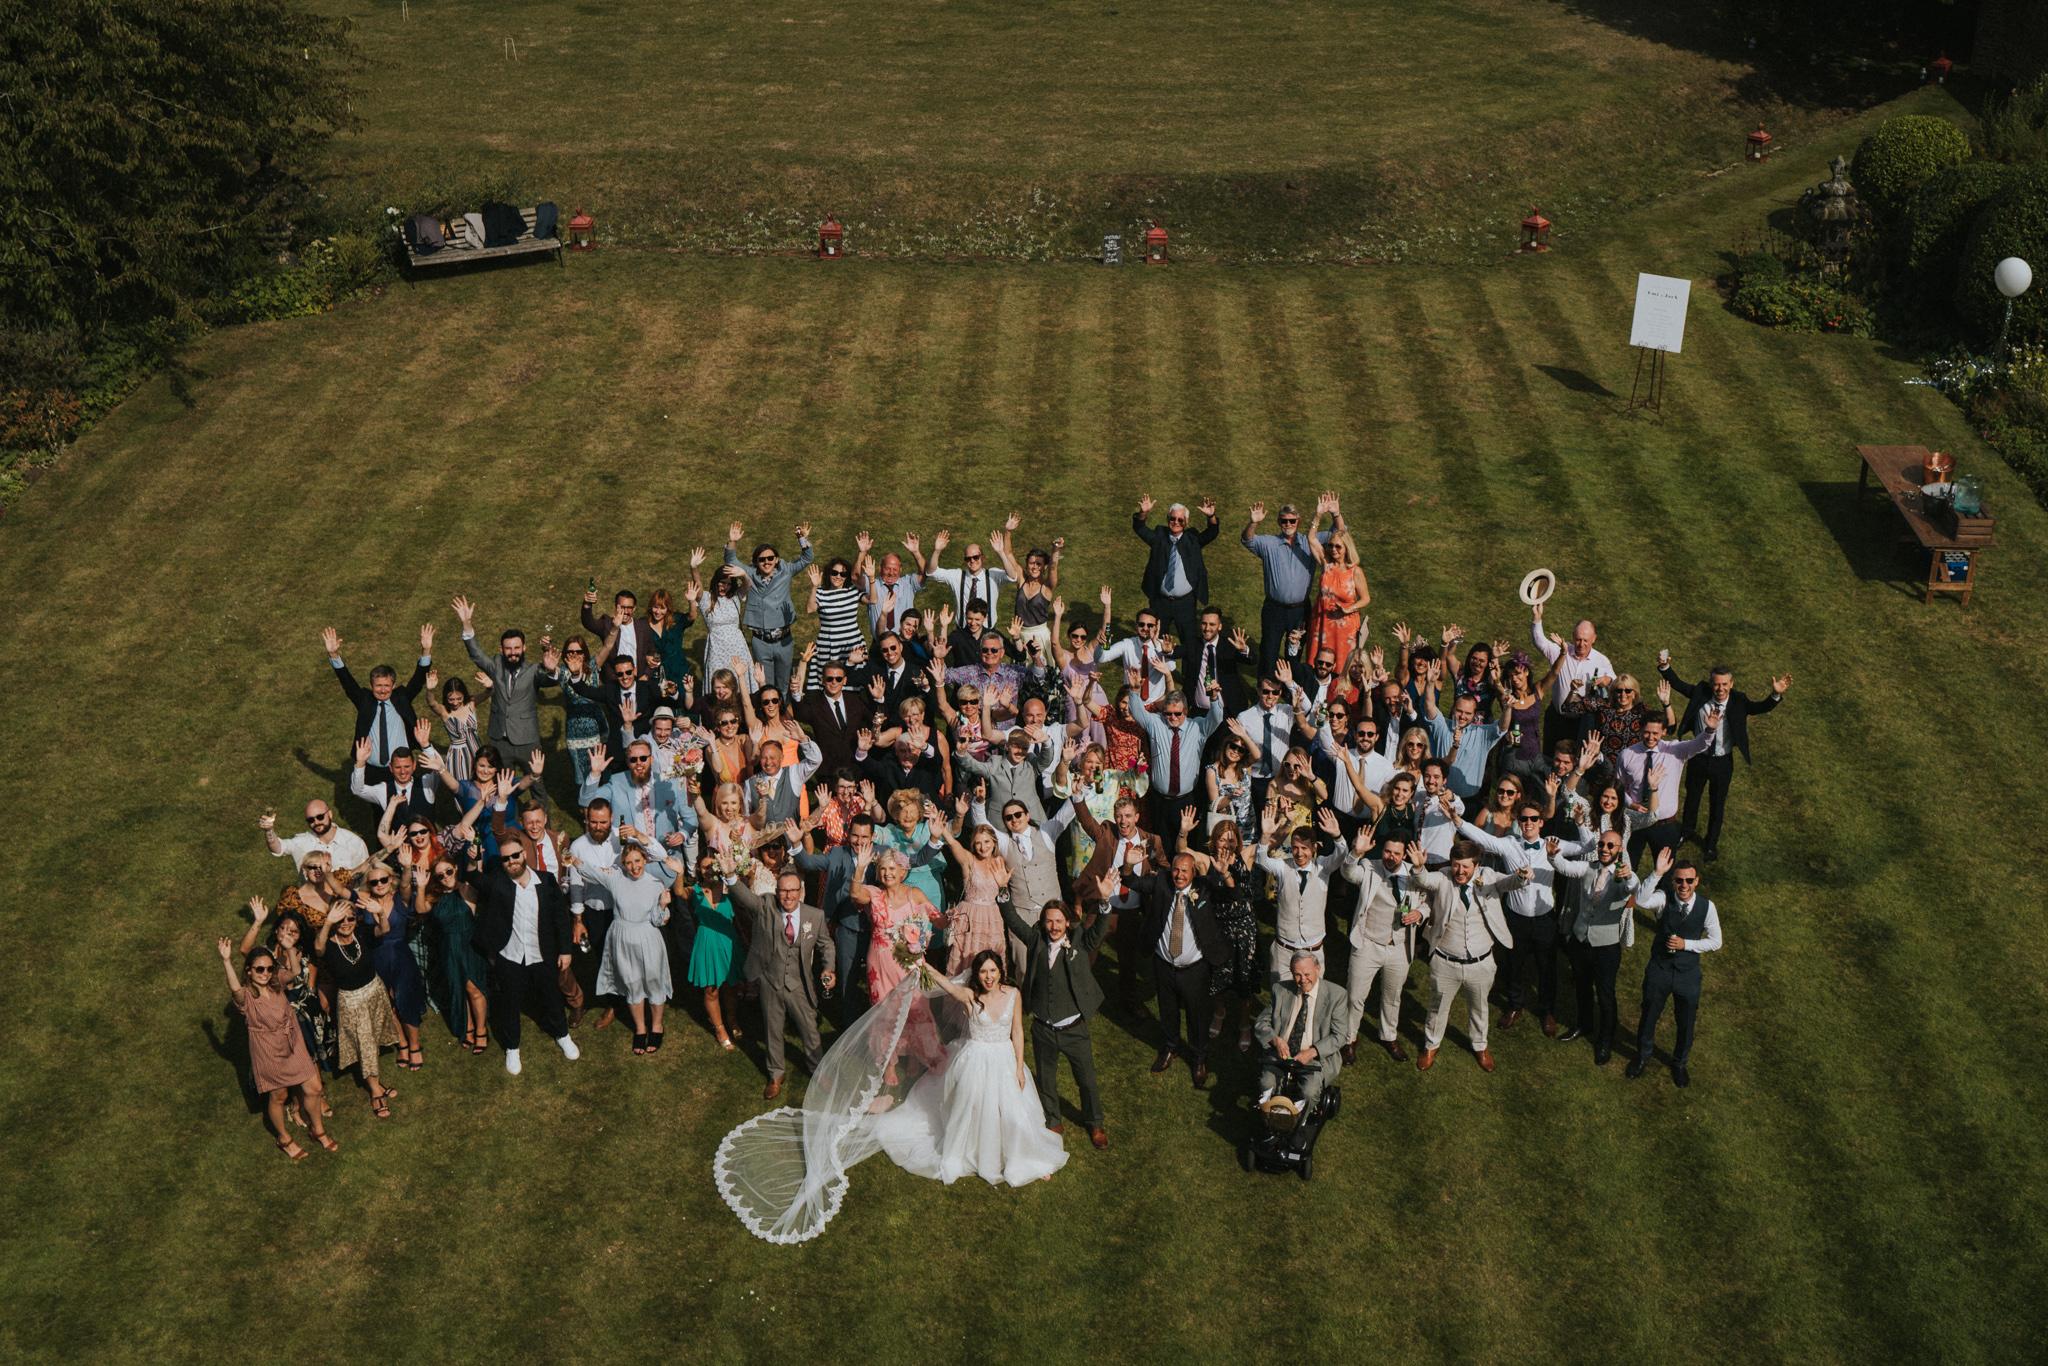 emi-Jack-boho-diy-wedding-eggington-house-grace-elizabeth-colchester-essex-alternative-wedding-photographer-suffolk-norfolk-devon (31 of 56).jpg